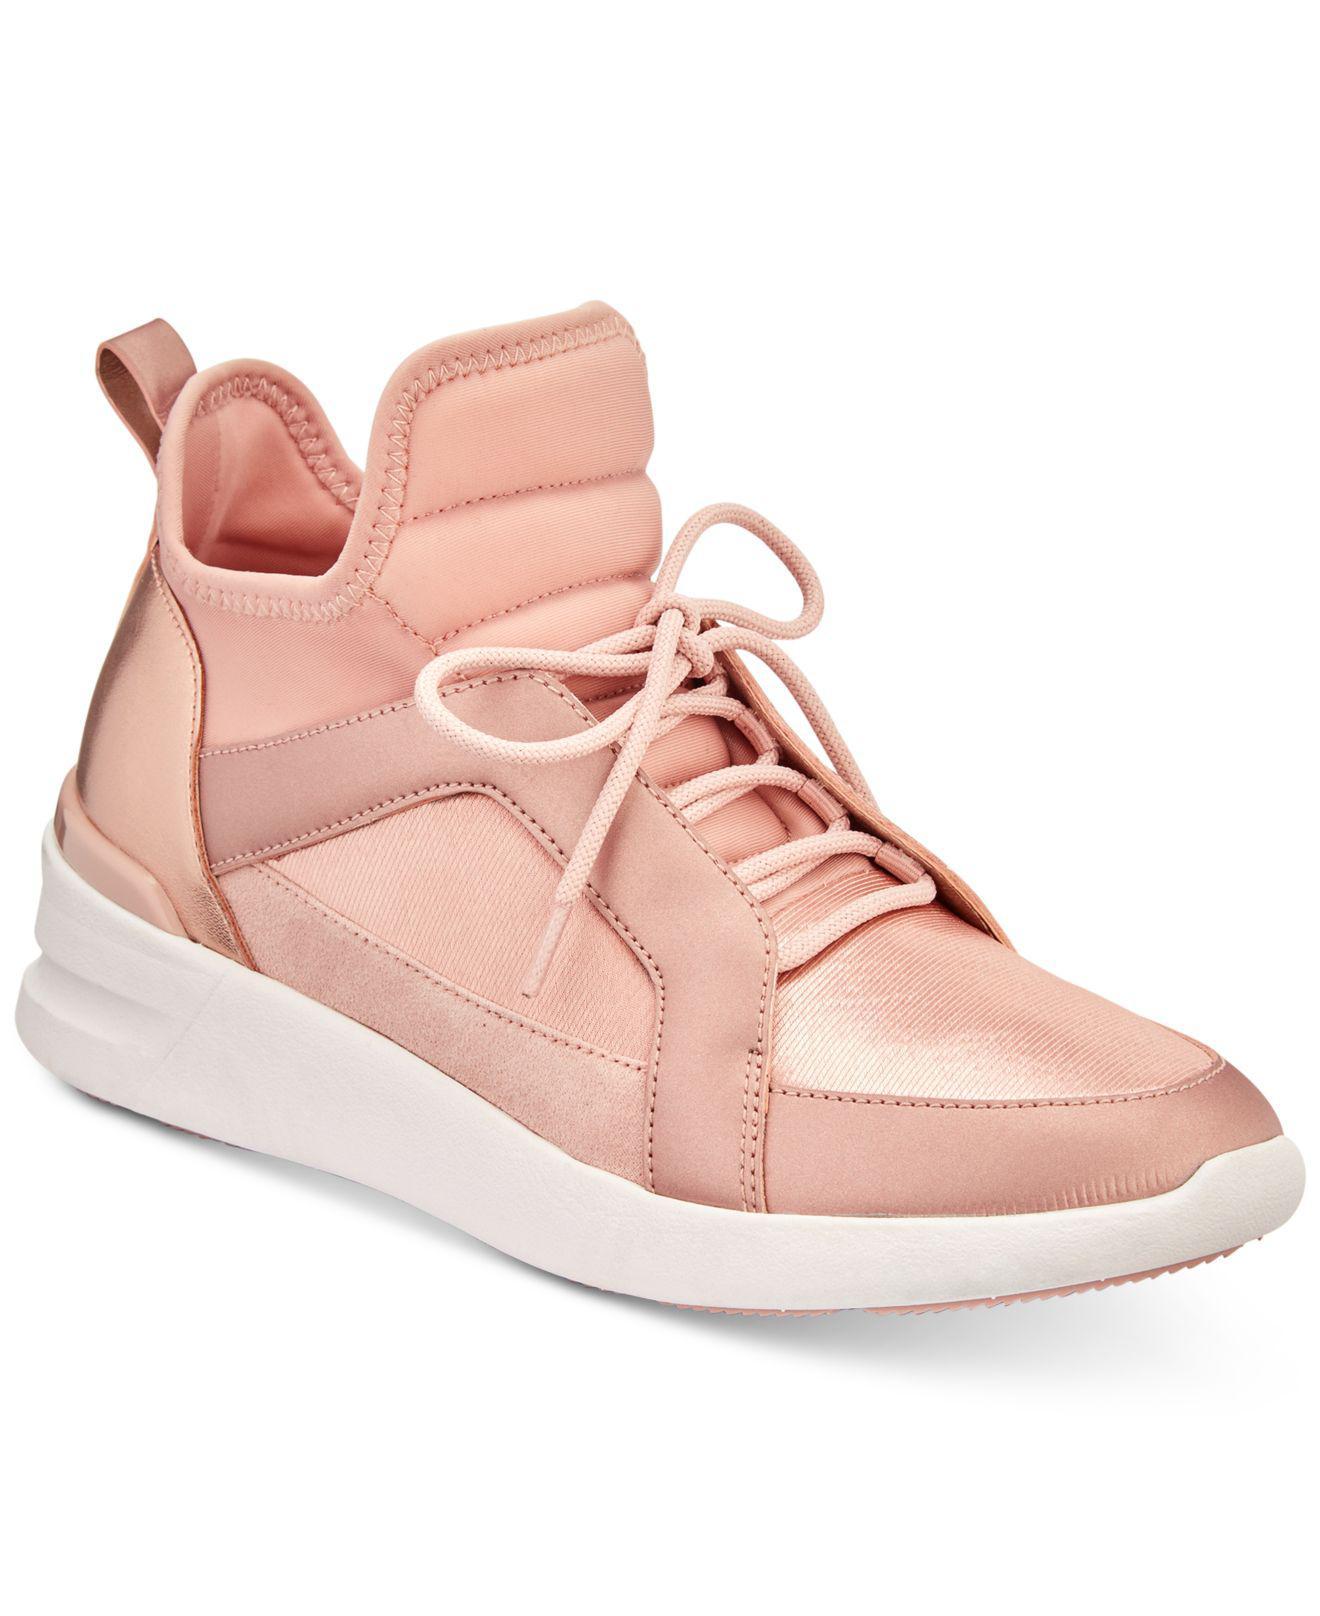 0ae55de3d45 Lyst - ALDO Kasssebaum Sneakers in Pink